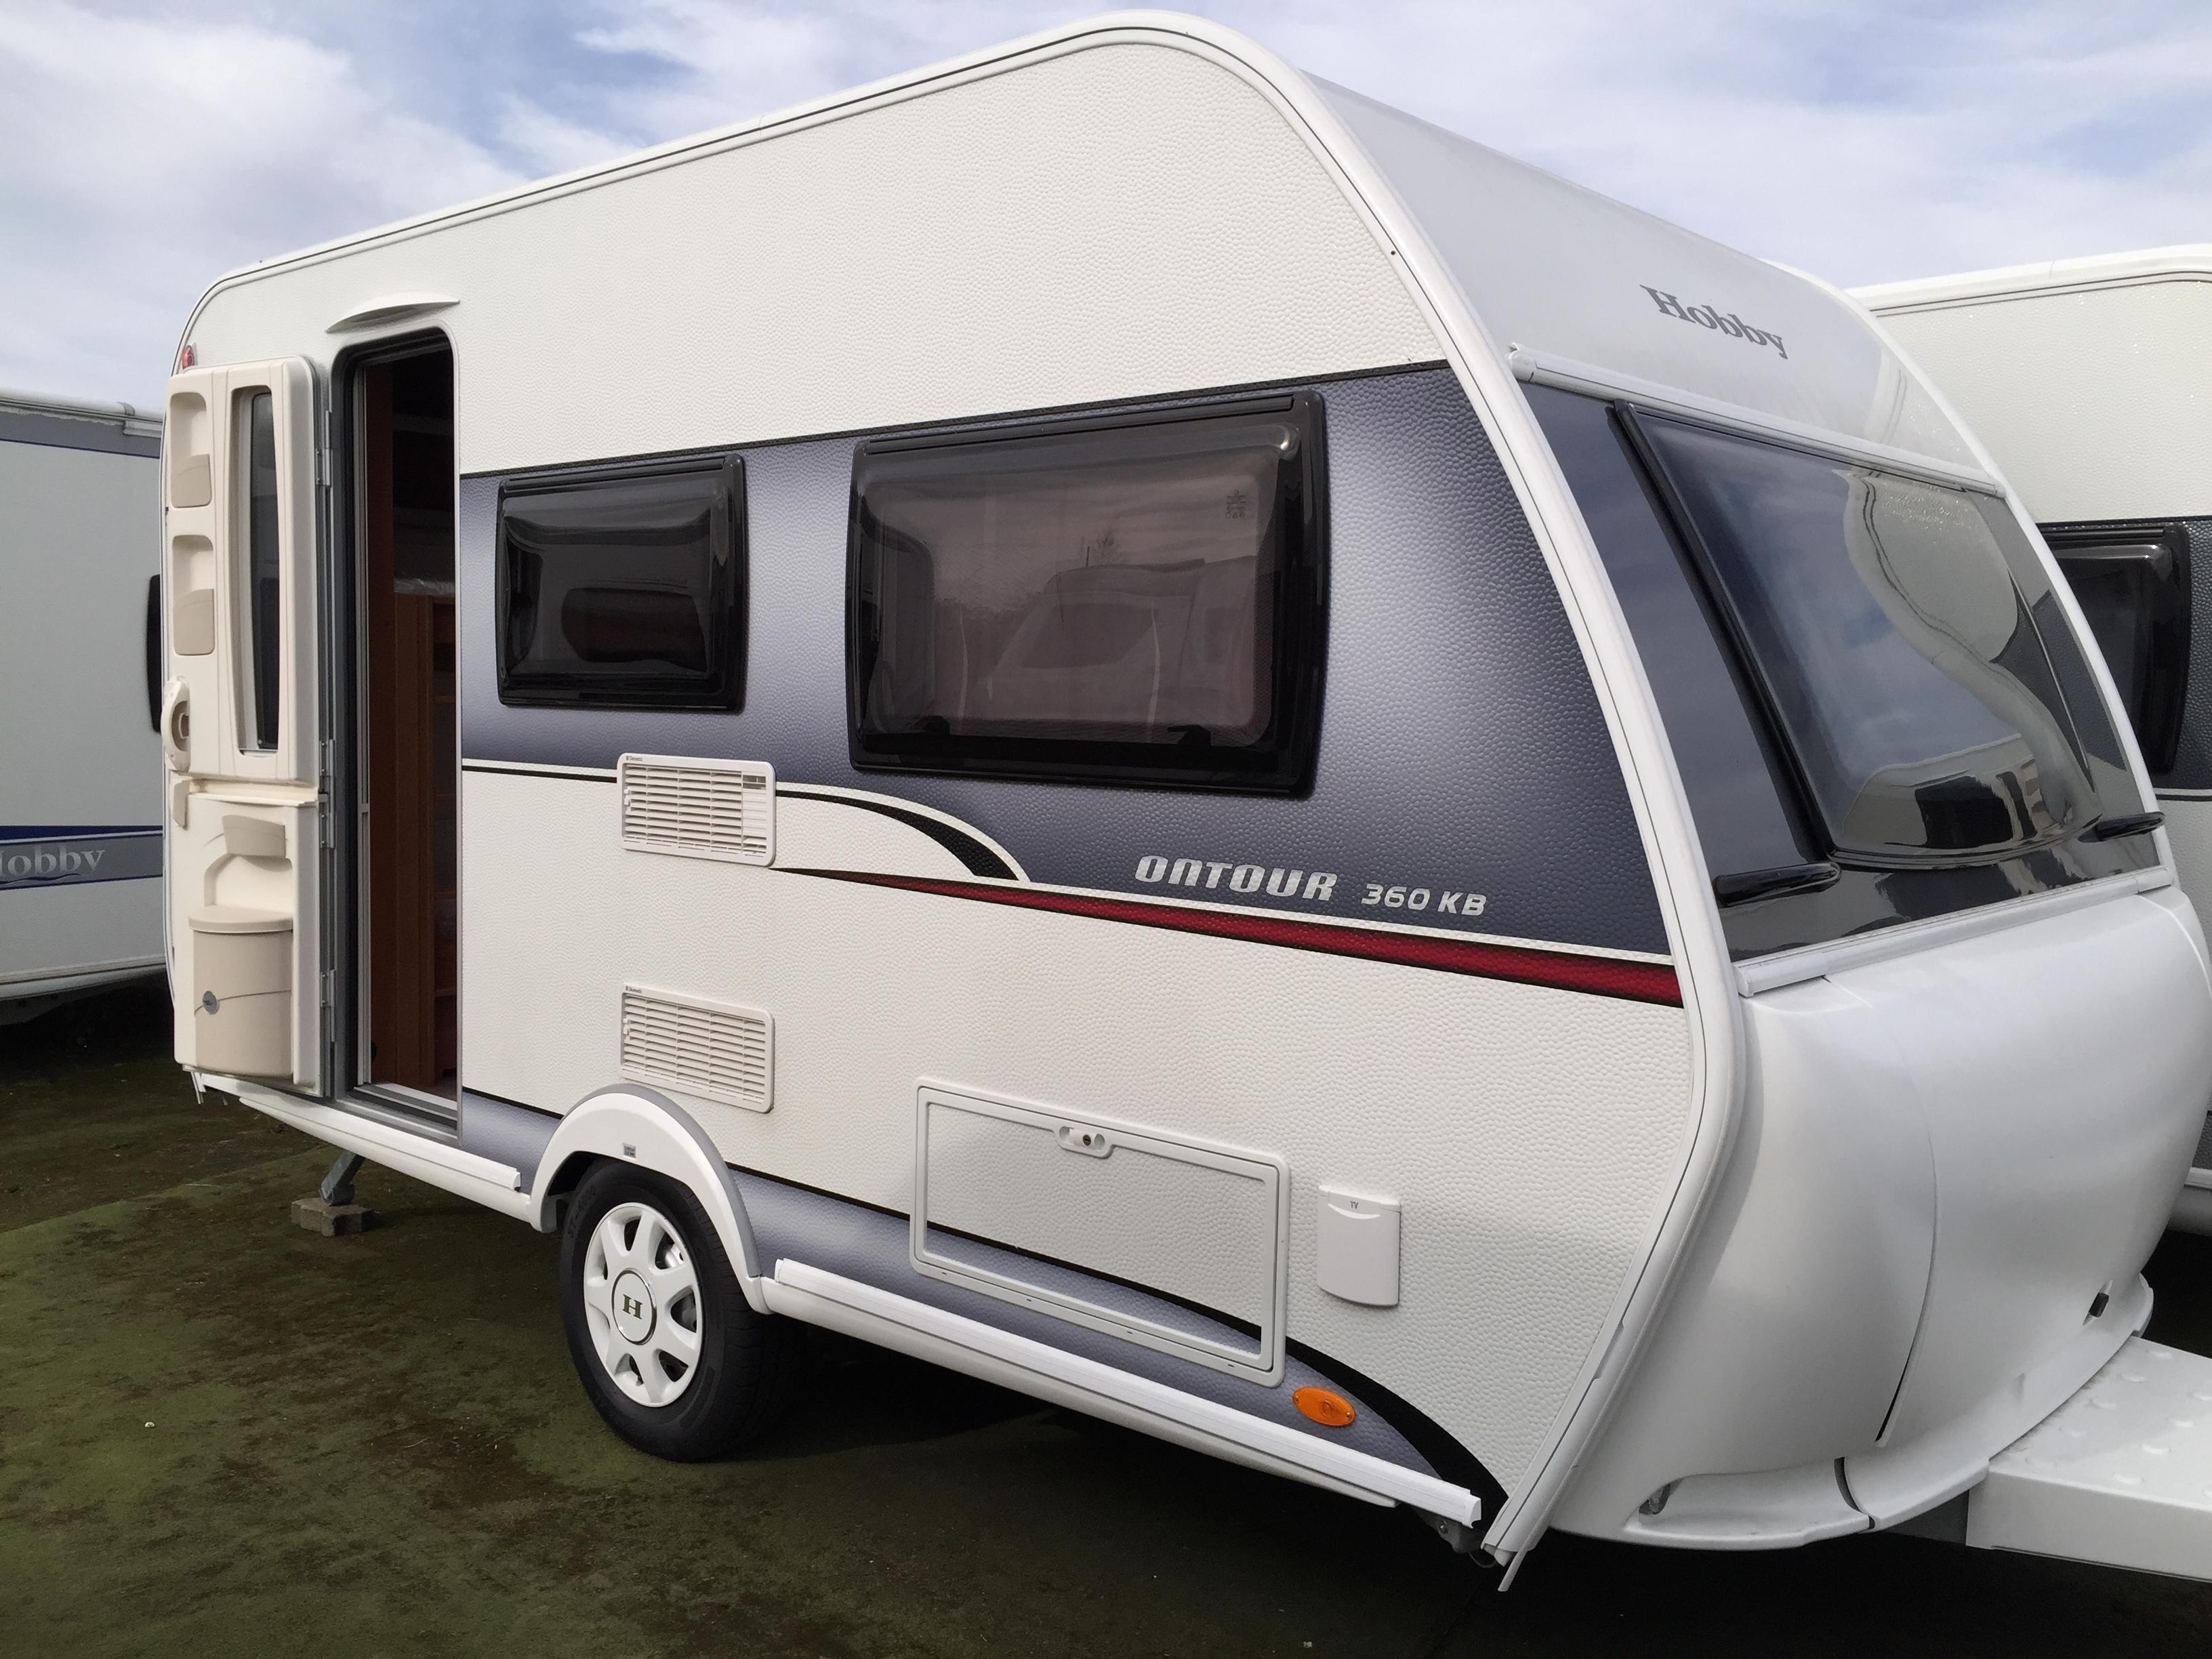 hobby 360 kb on tour neuf de 2016 caravane en vente oberschaeffolsheim rhin 67. Black Bedroom Furniture Sets. Home Design Ideas